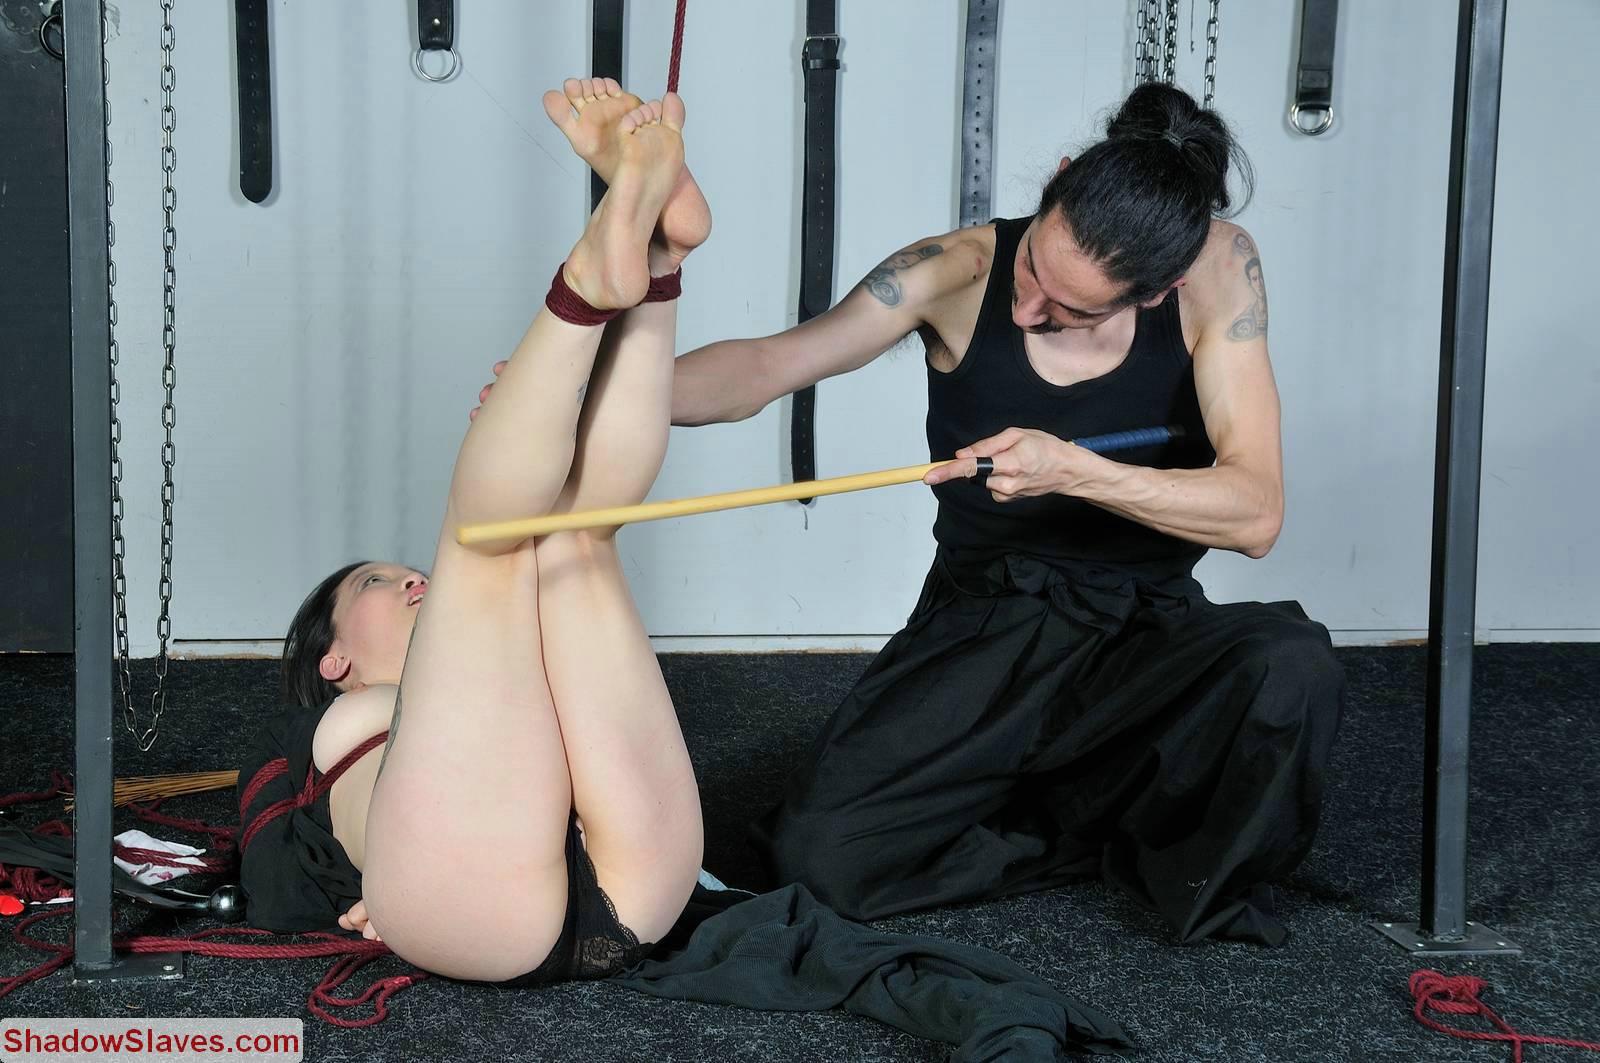 Extreme foot fetish porn